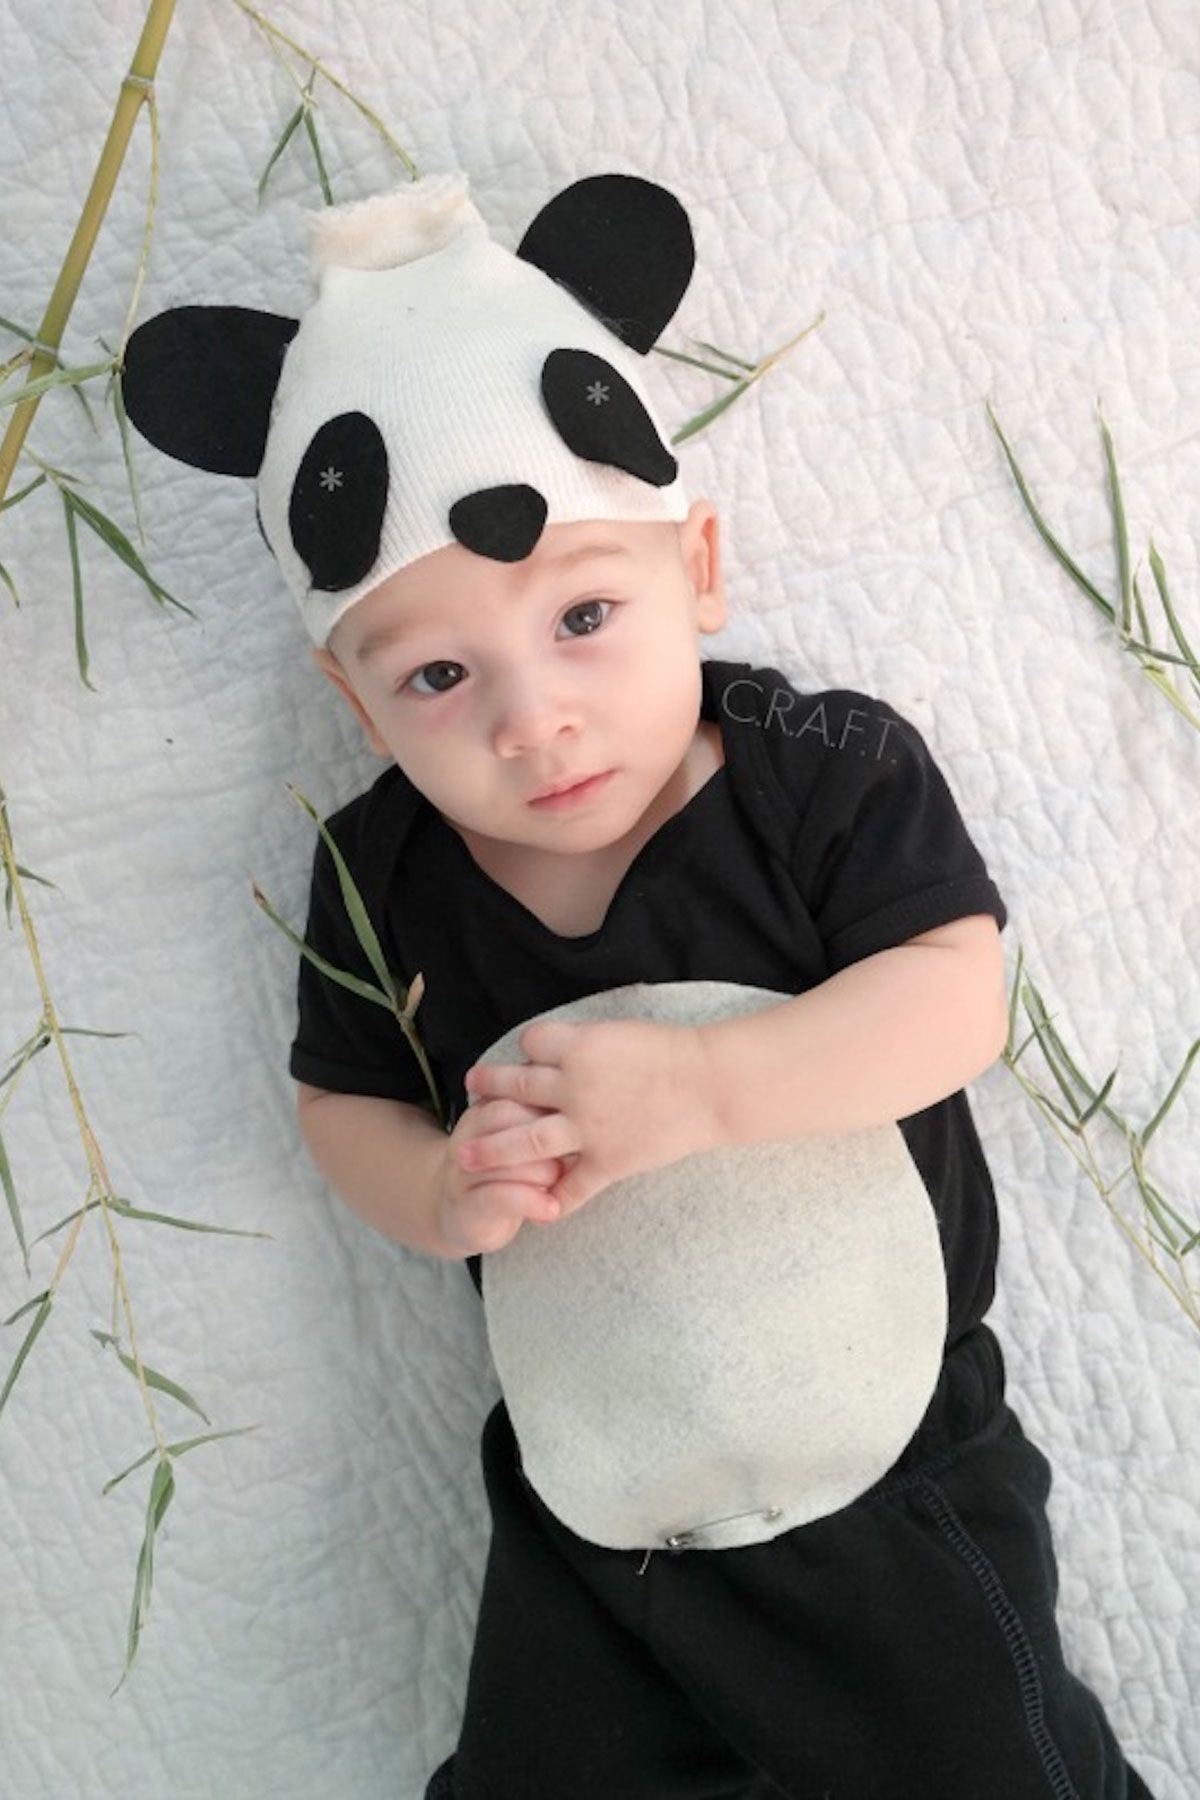 da57582ce3 75+ Homemade Halloween Costumes for Kids - Easy DIY Kids Halloween Costume  Ideas 2018